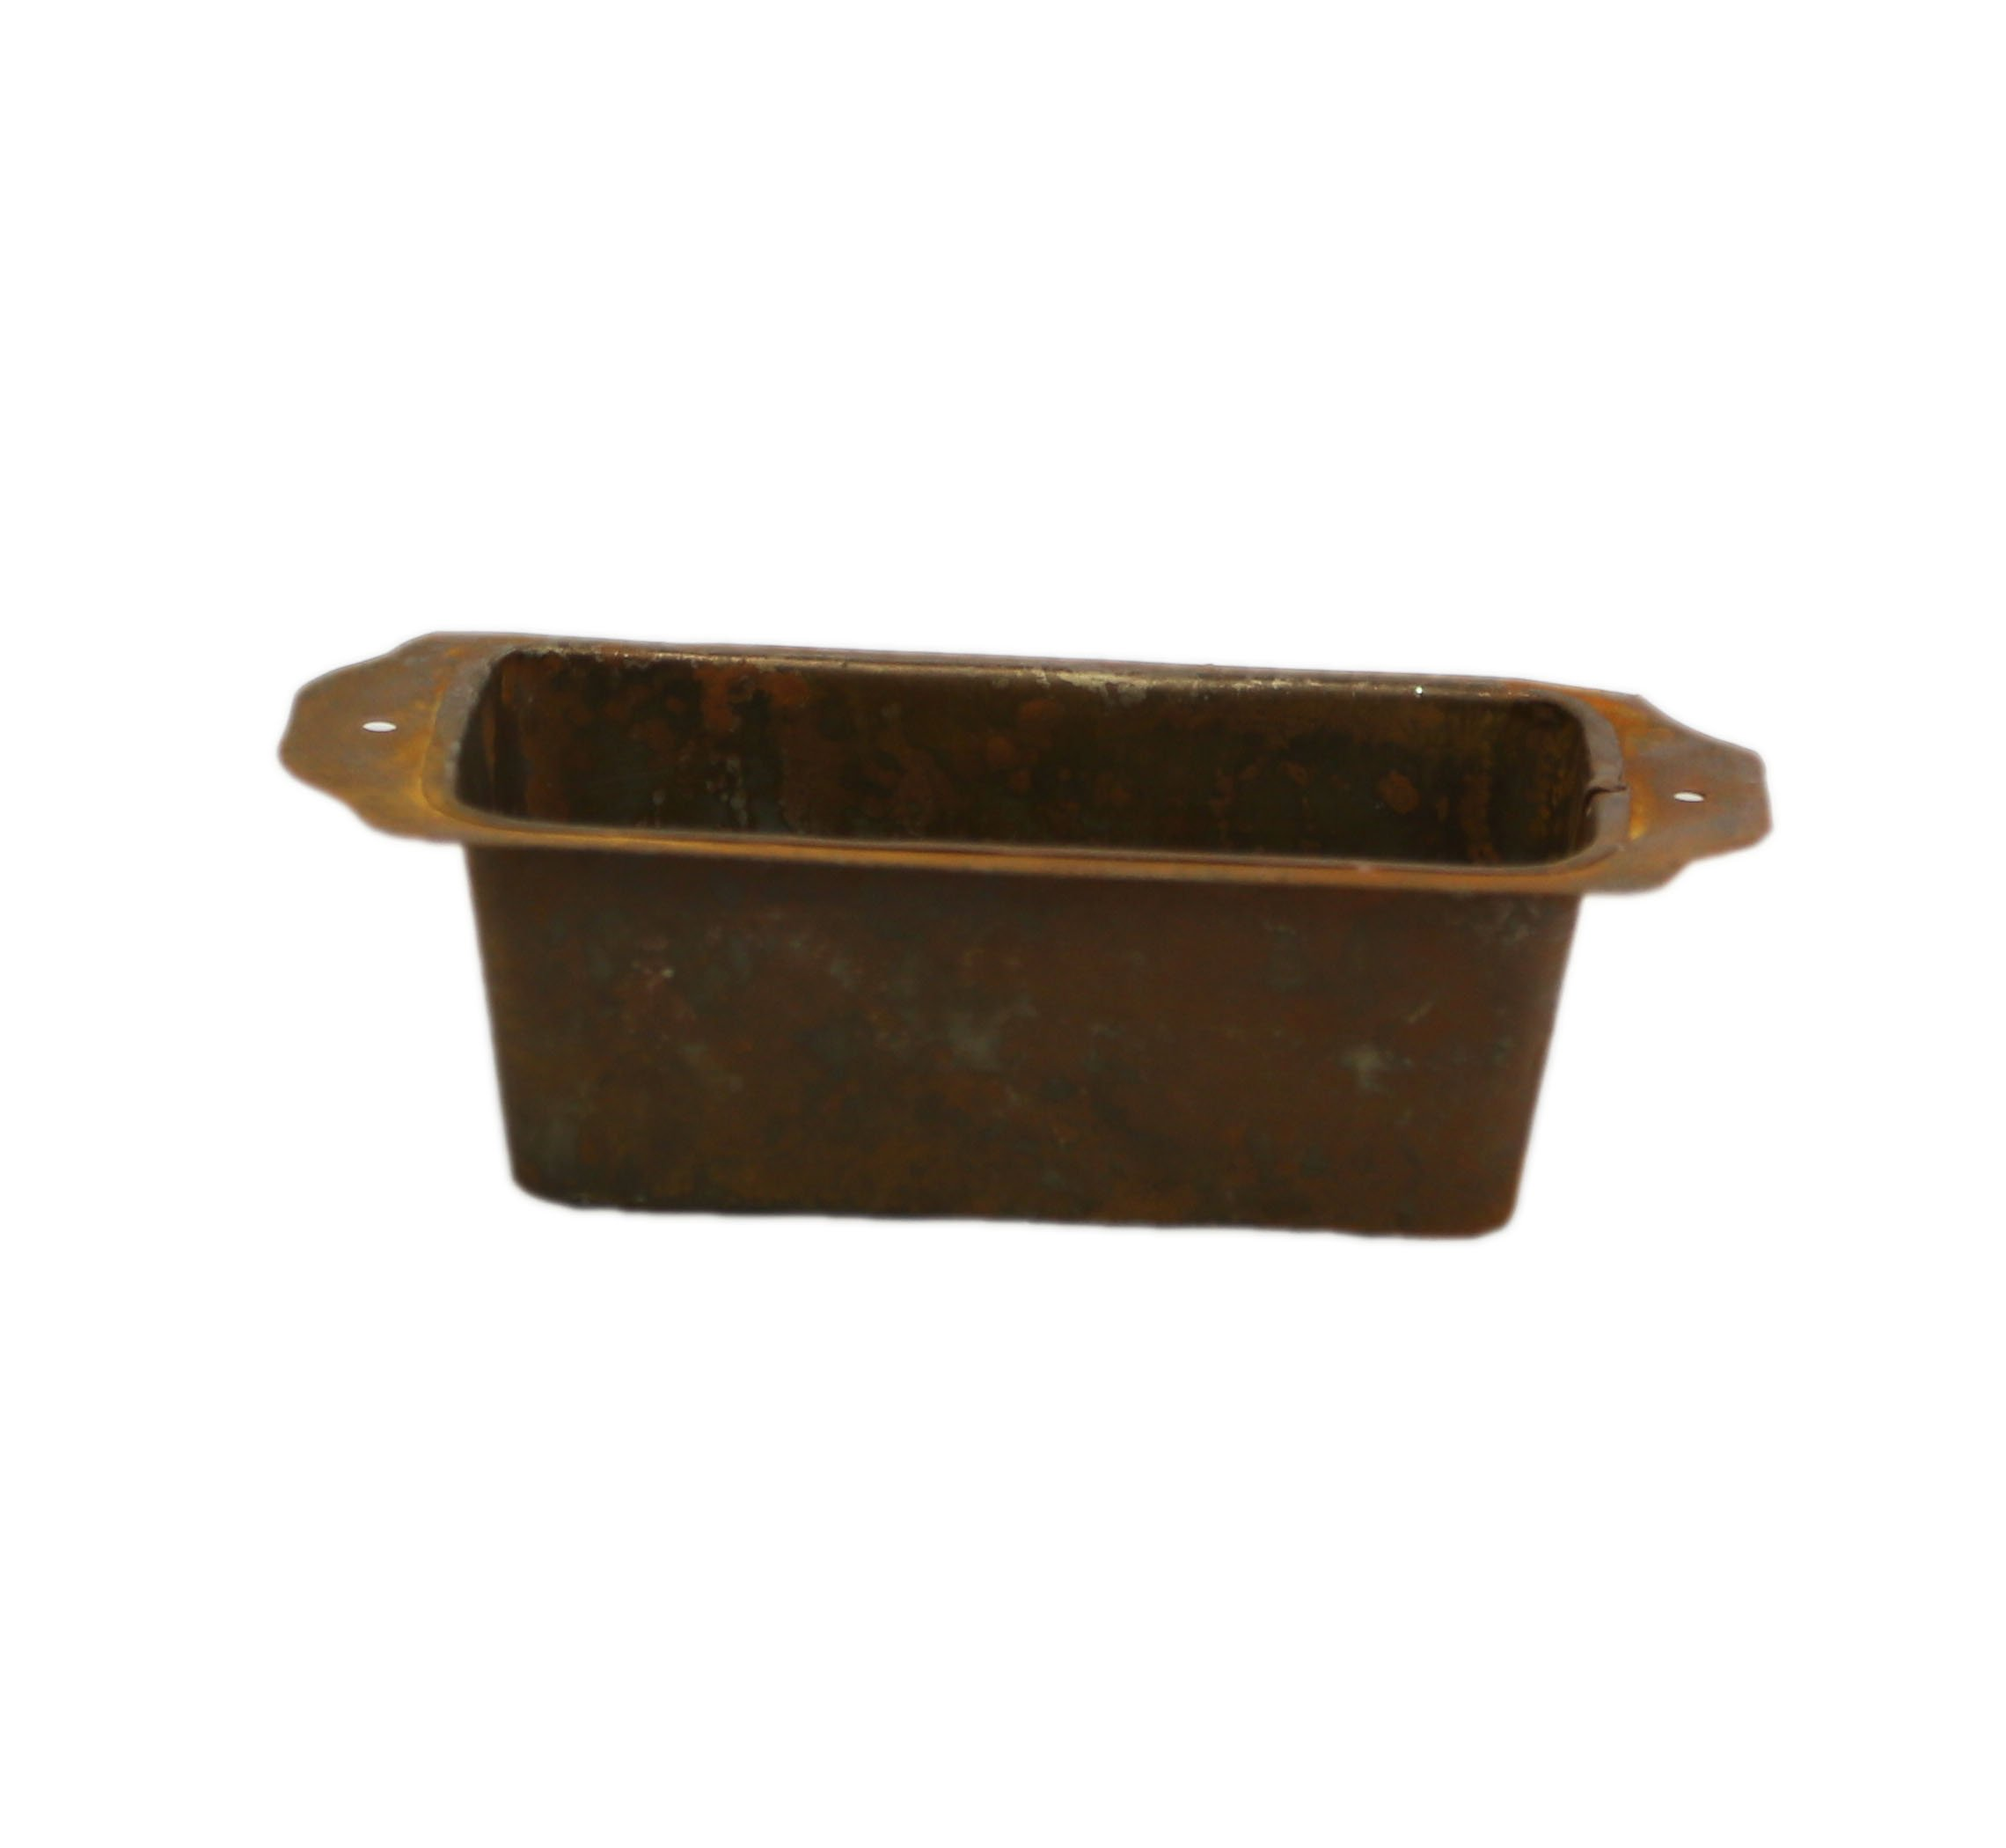 Rusty Decorative Loaf Pan - Set Of 3